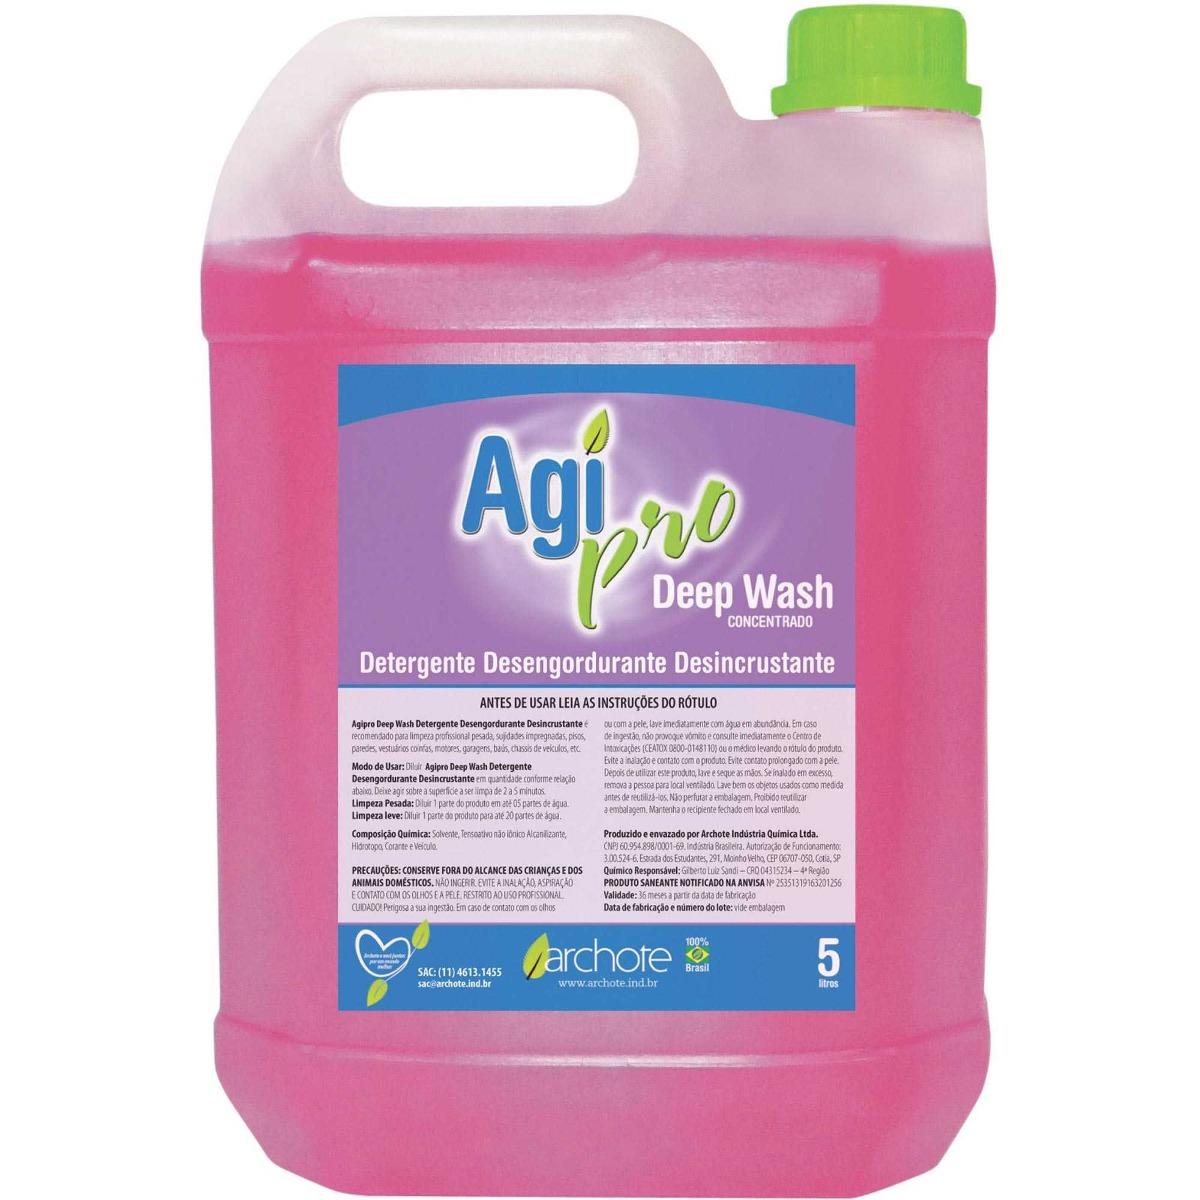 Detergente Liquido Agipro Desincrustante 5 Litros Archote R 50 26